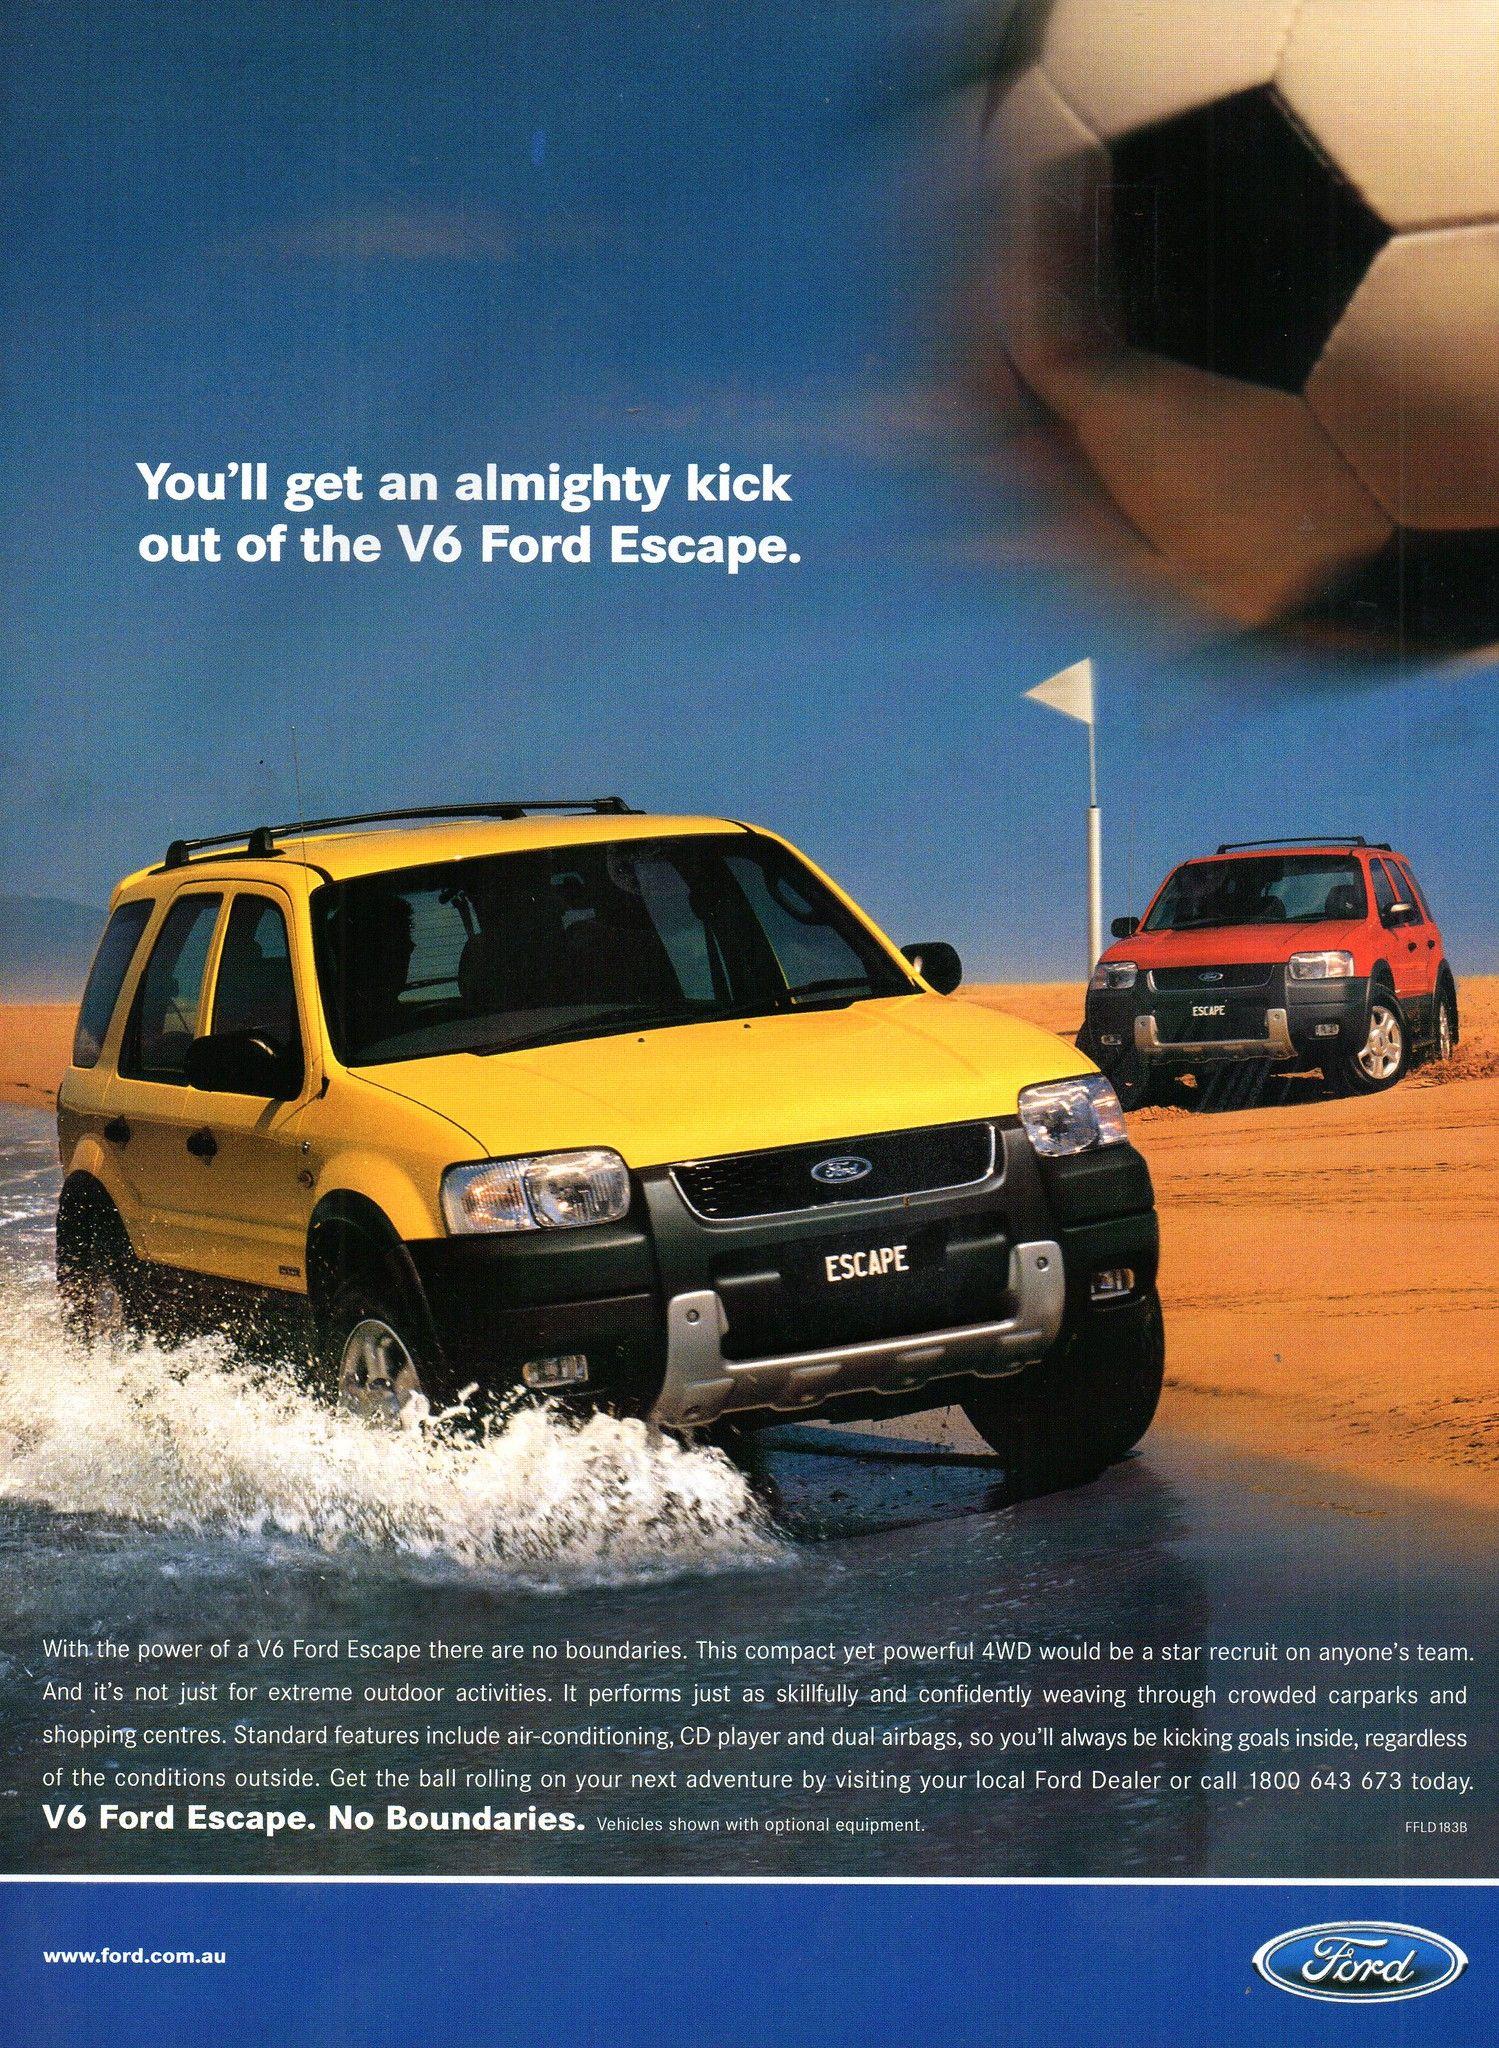 2002 Ford Escape V6 4wd Aussie Original Magazine Advertisement